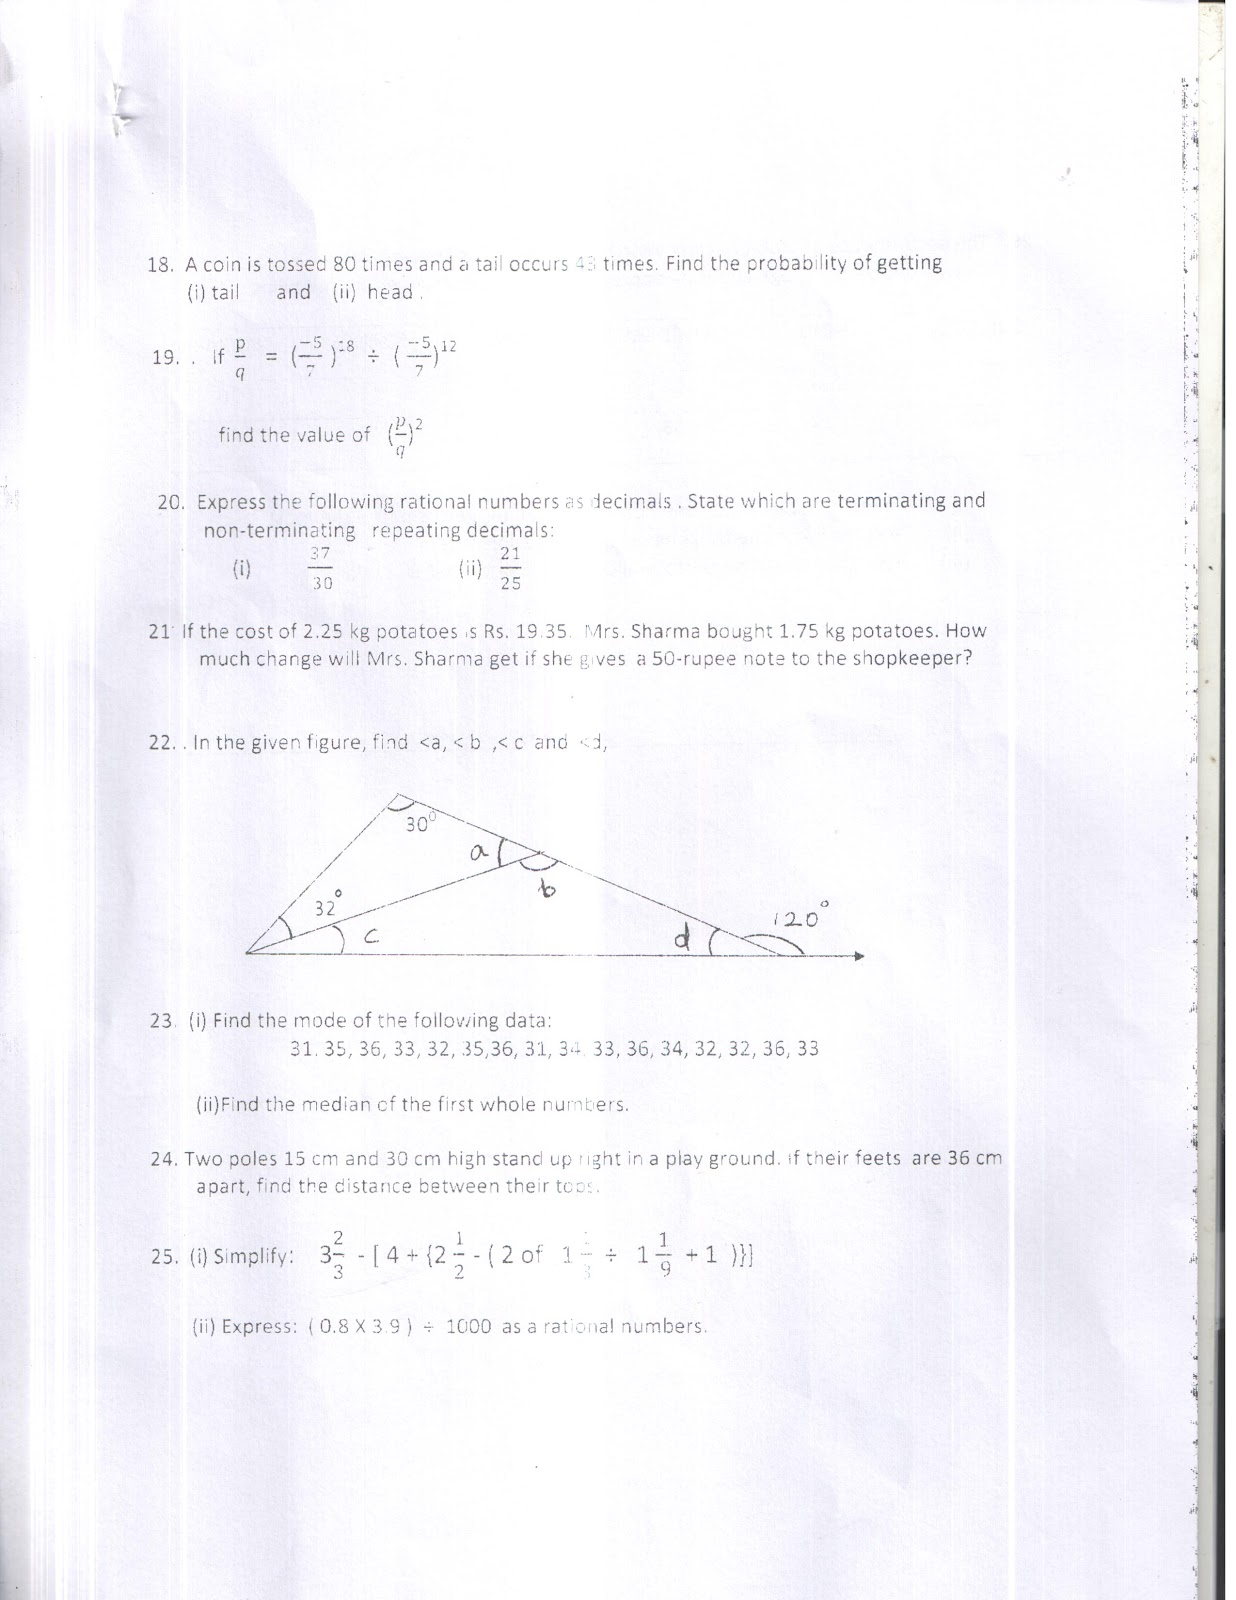 APSG: Class VII Mathematics Modal Paper